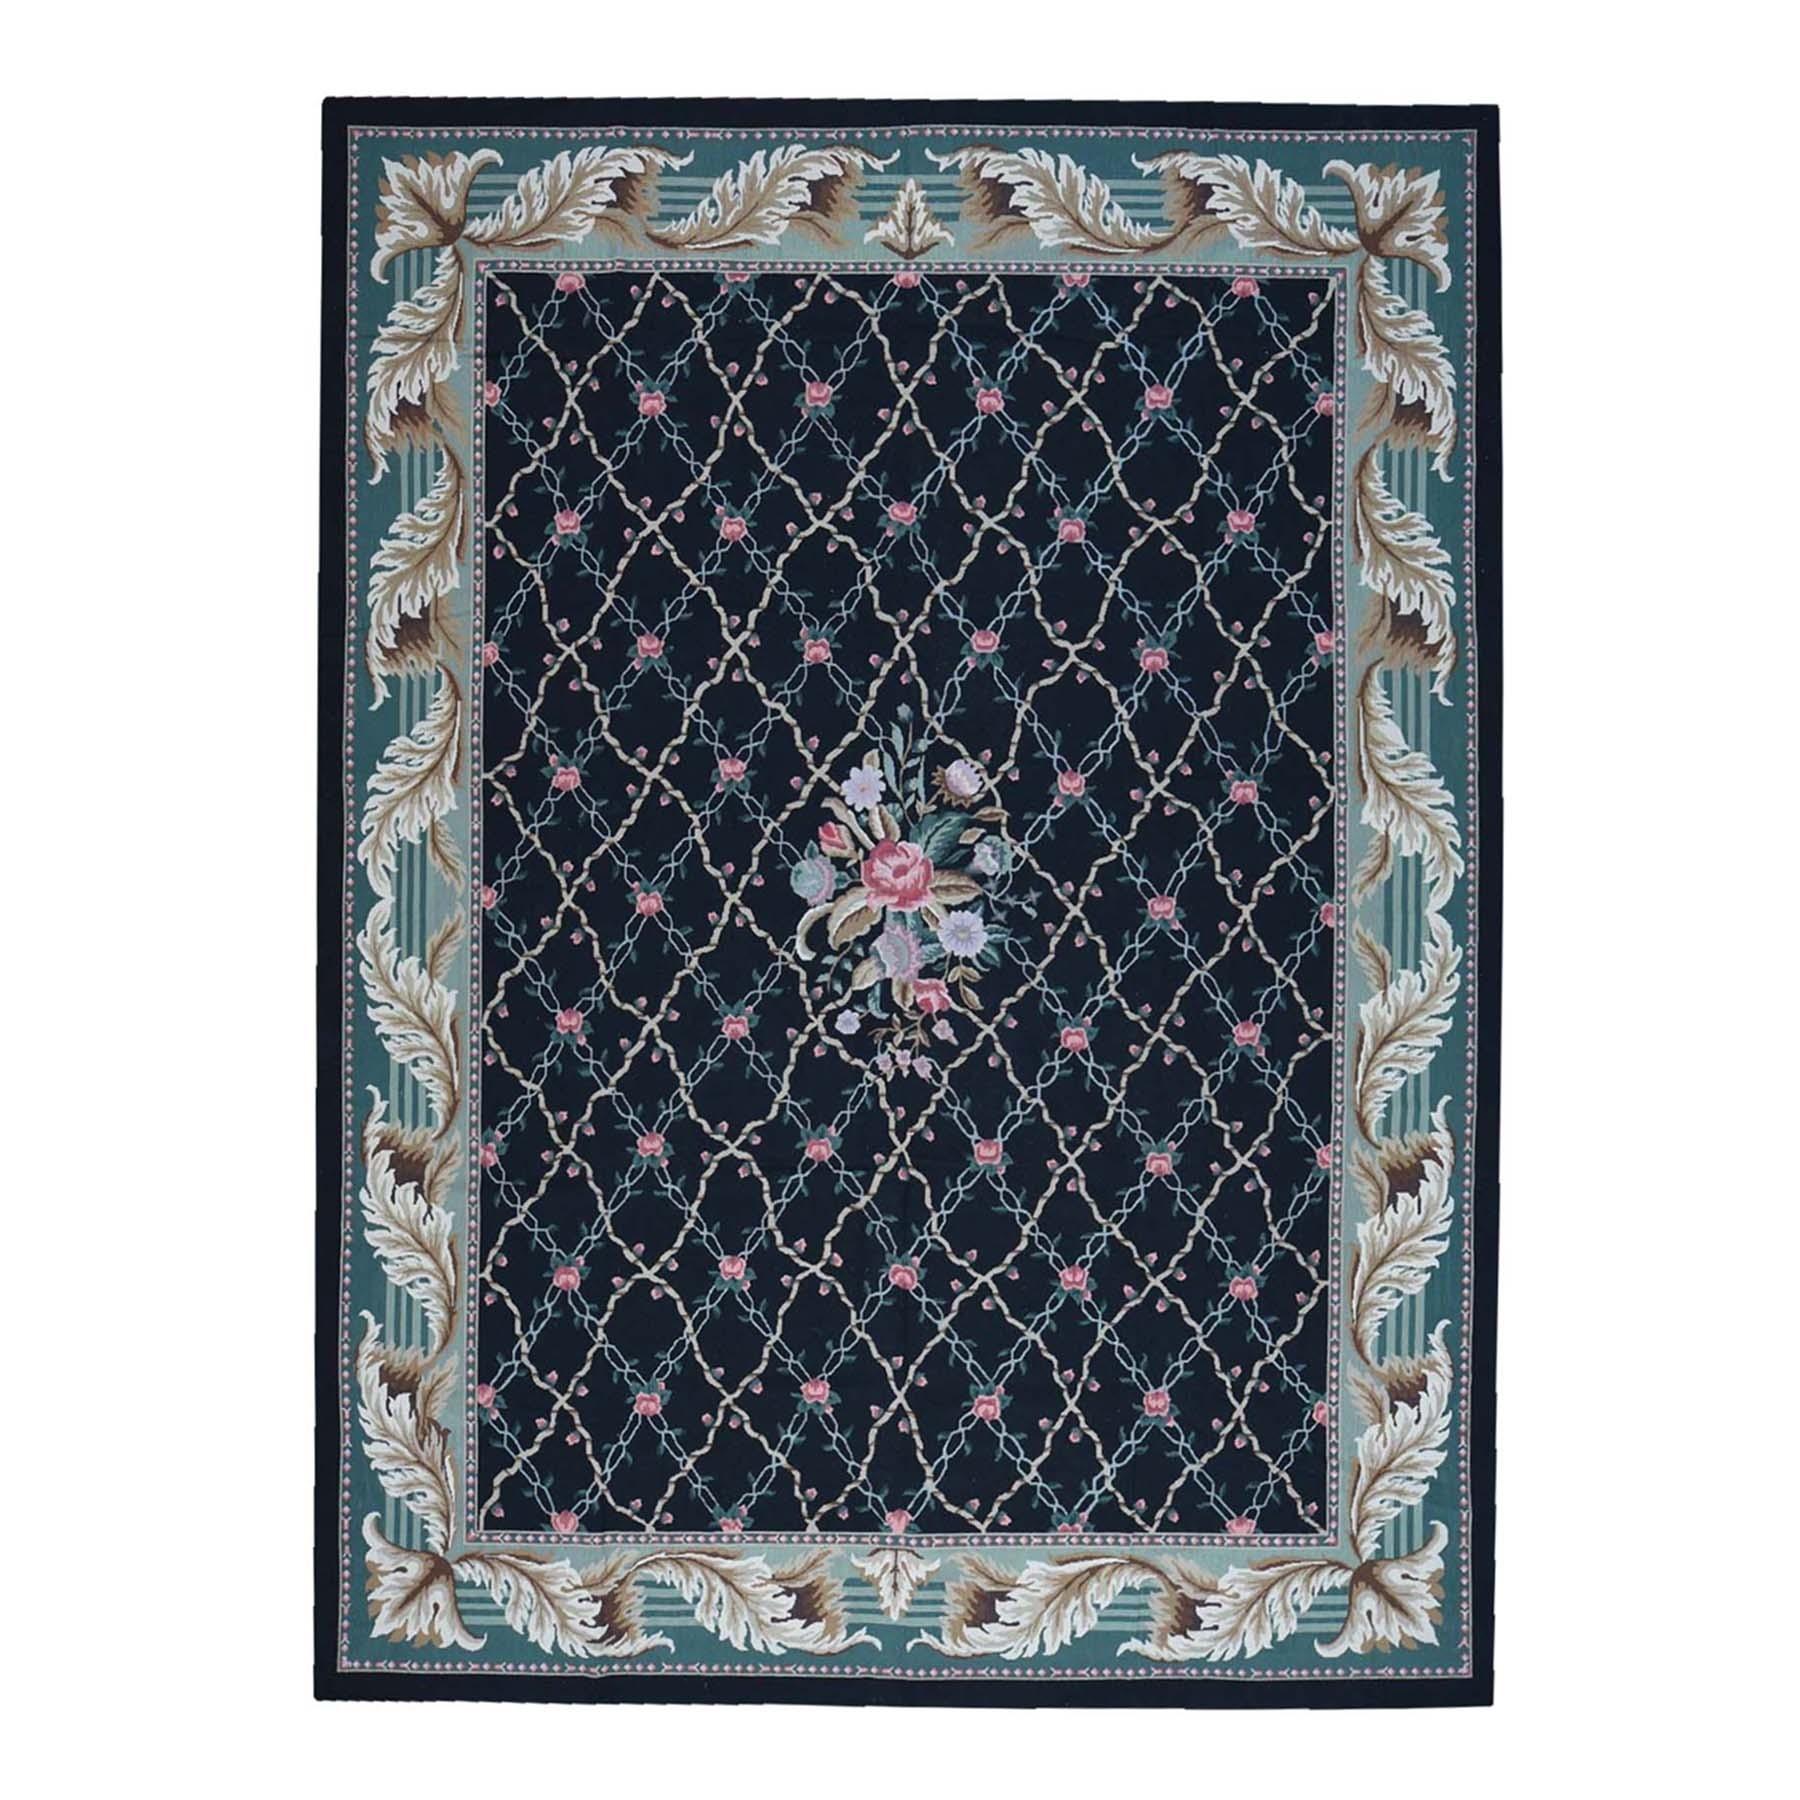 Elegant European Collection Hand Stitched Black Rug No: 166472